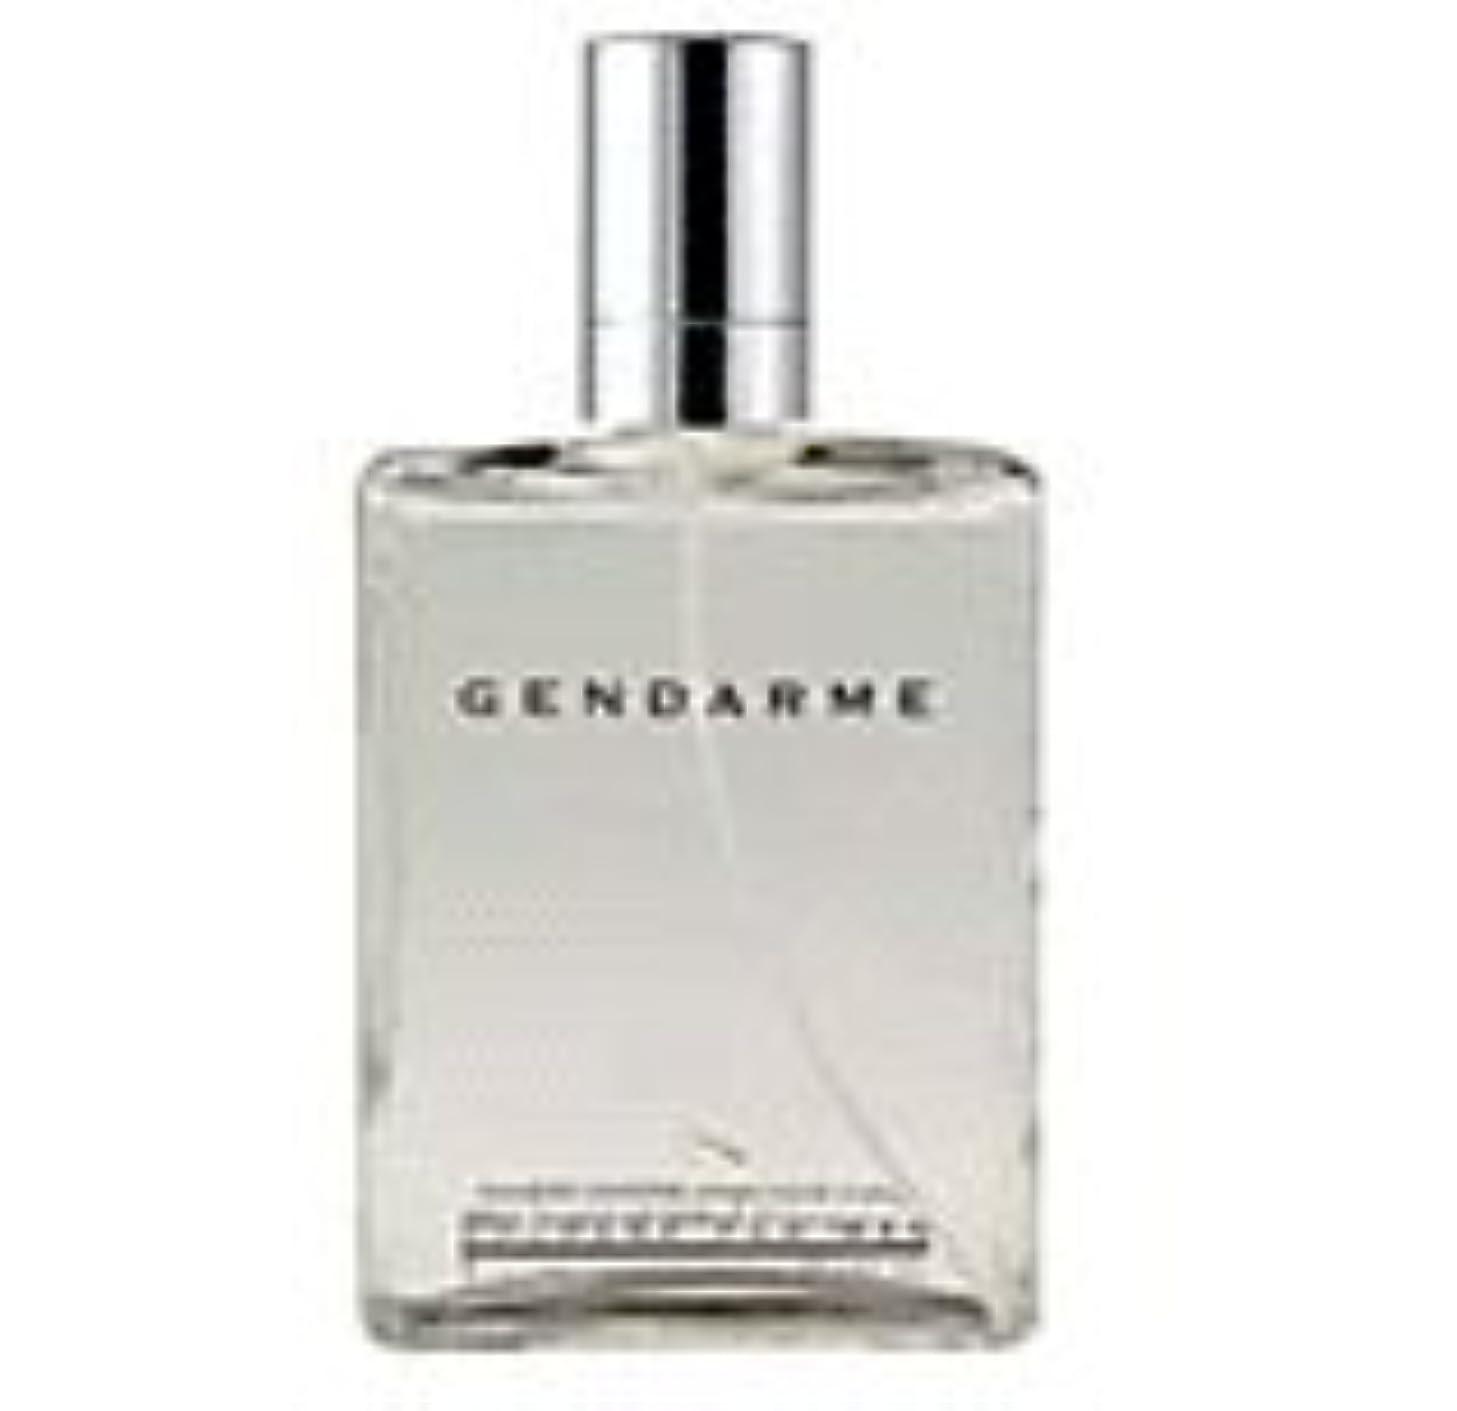 Gendarme (ゲンダーム) 4.0 oz (120ml) Cologne Spray for Men